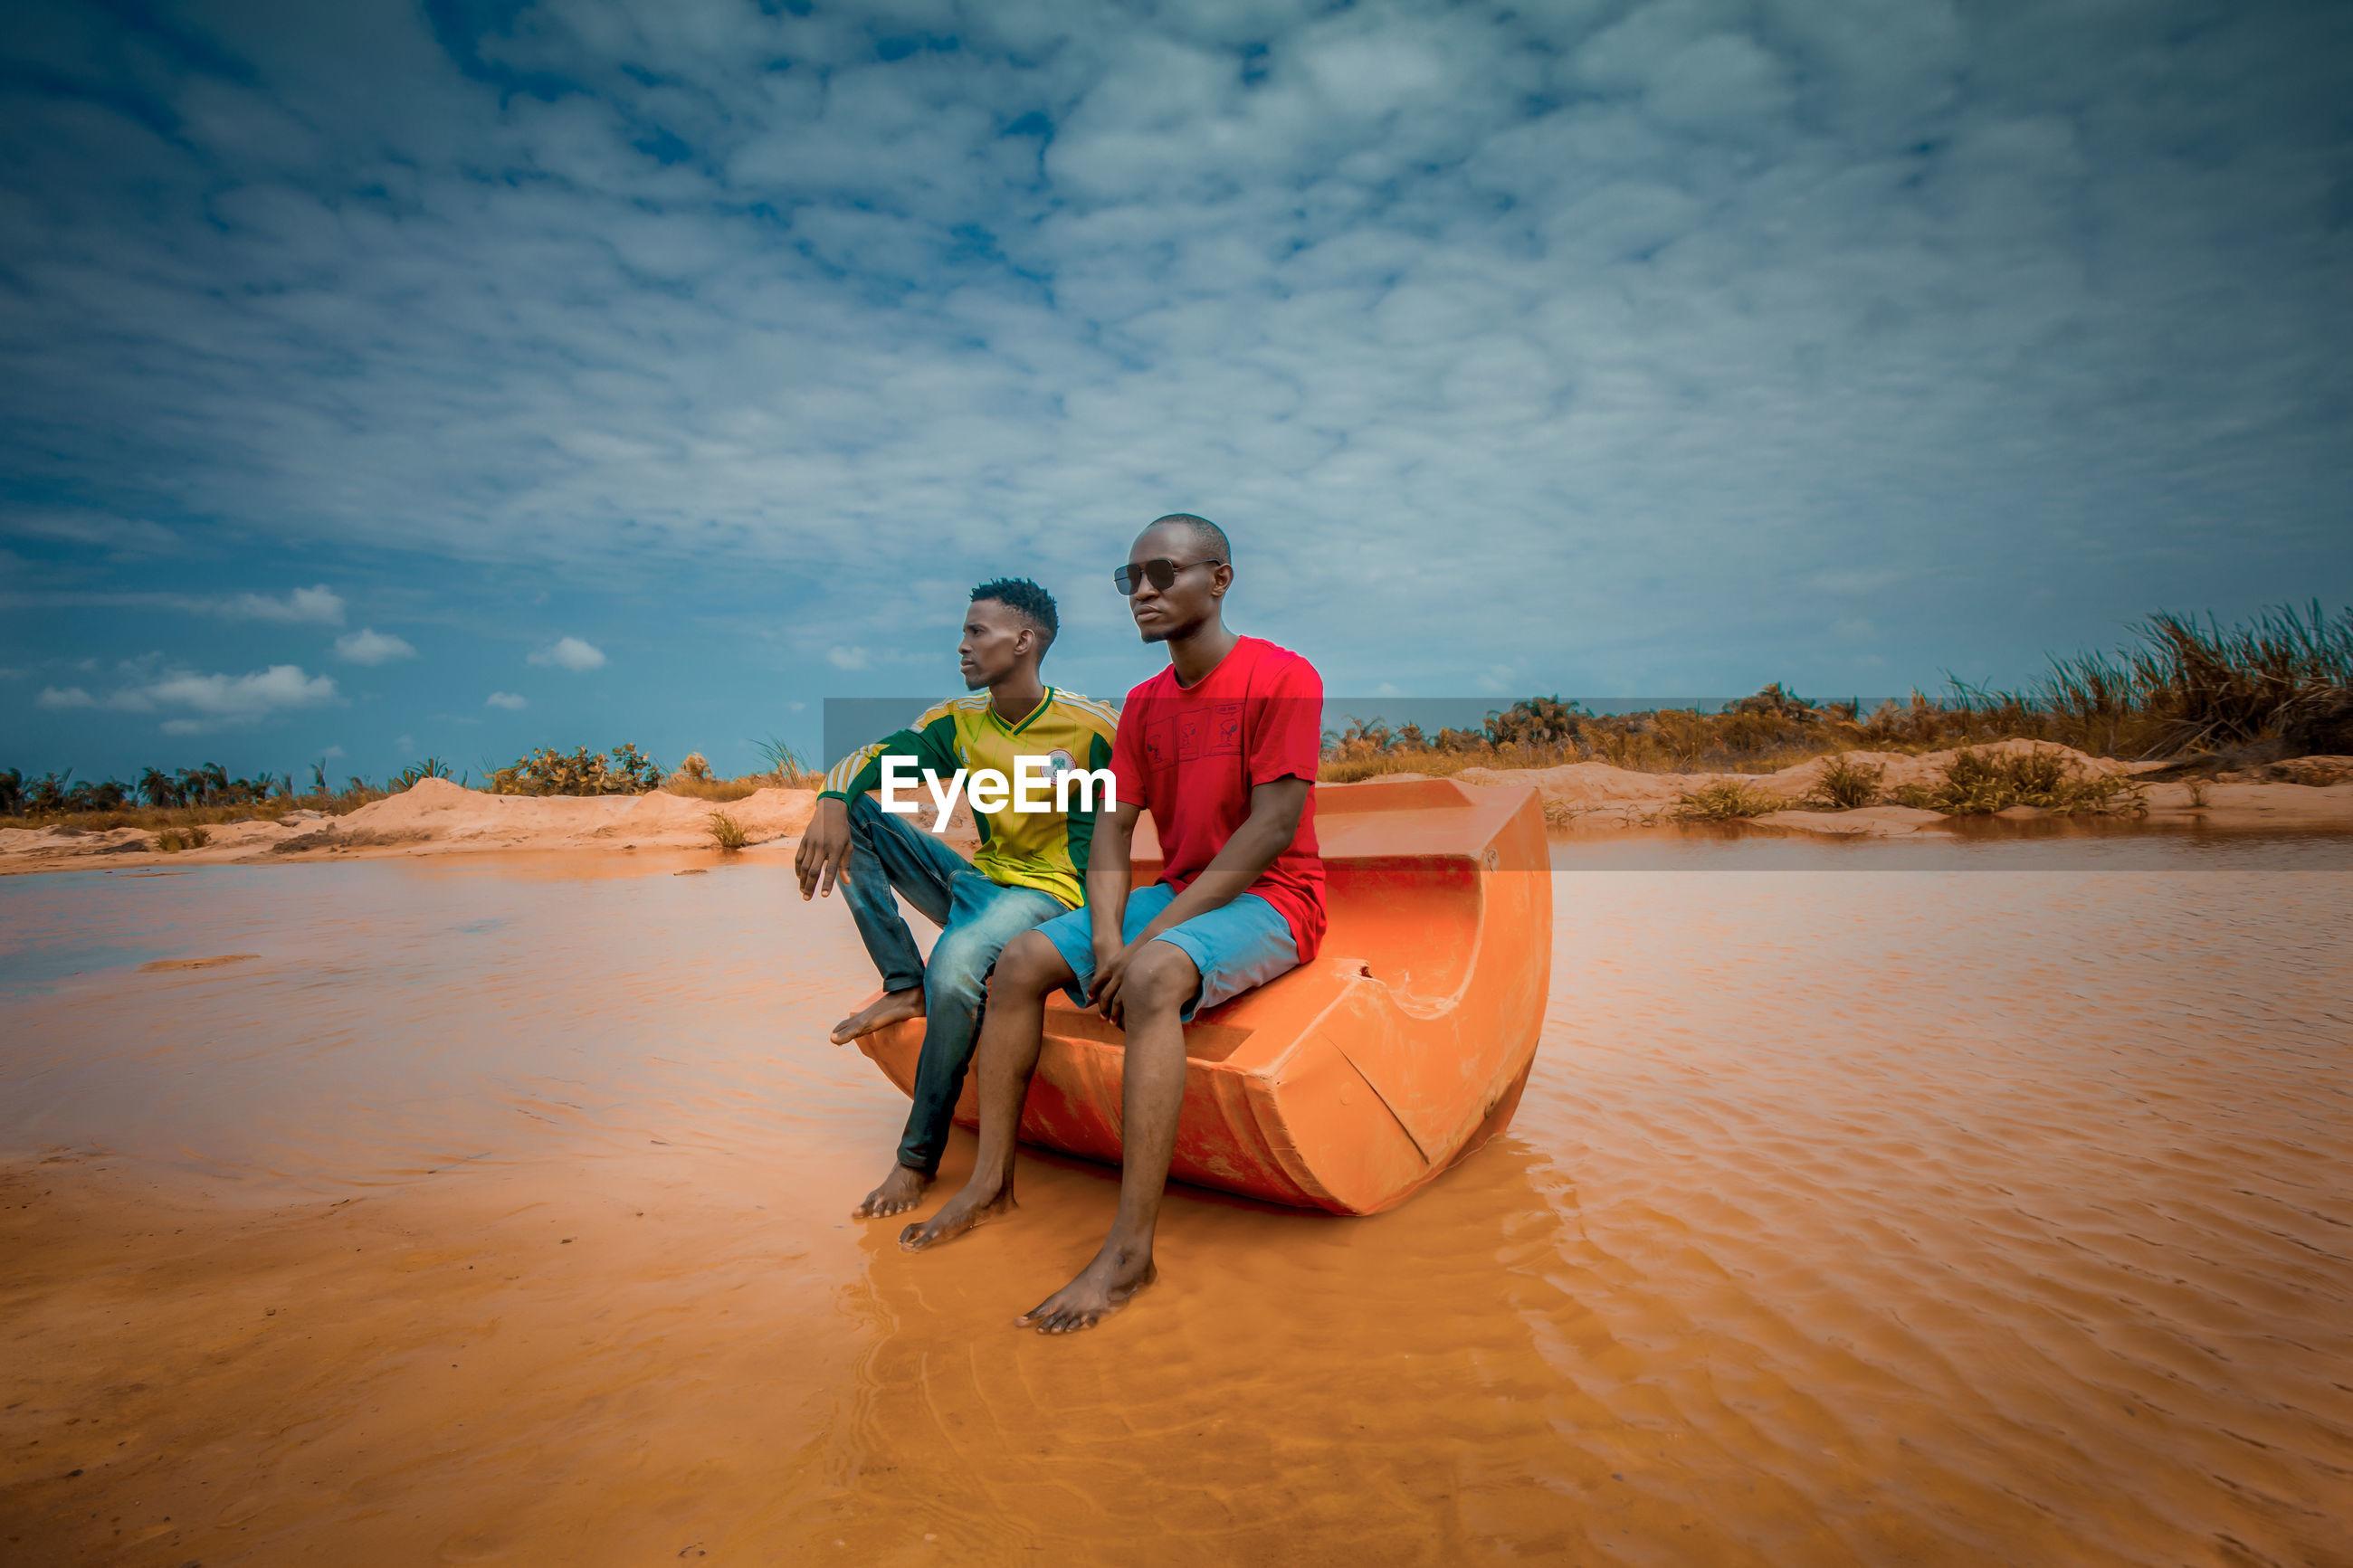 PORTRAIT OF MEN SITTING IN WATER AGAINST SKY